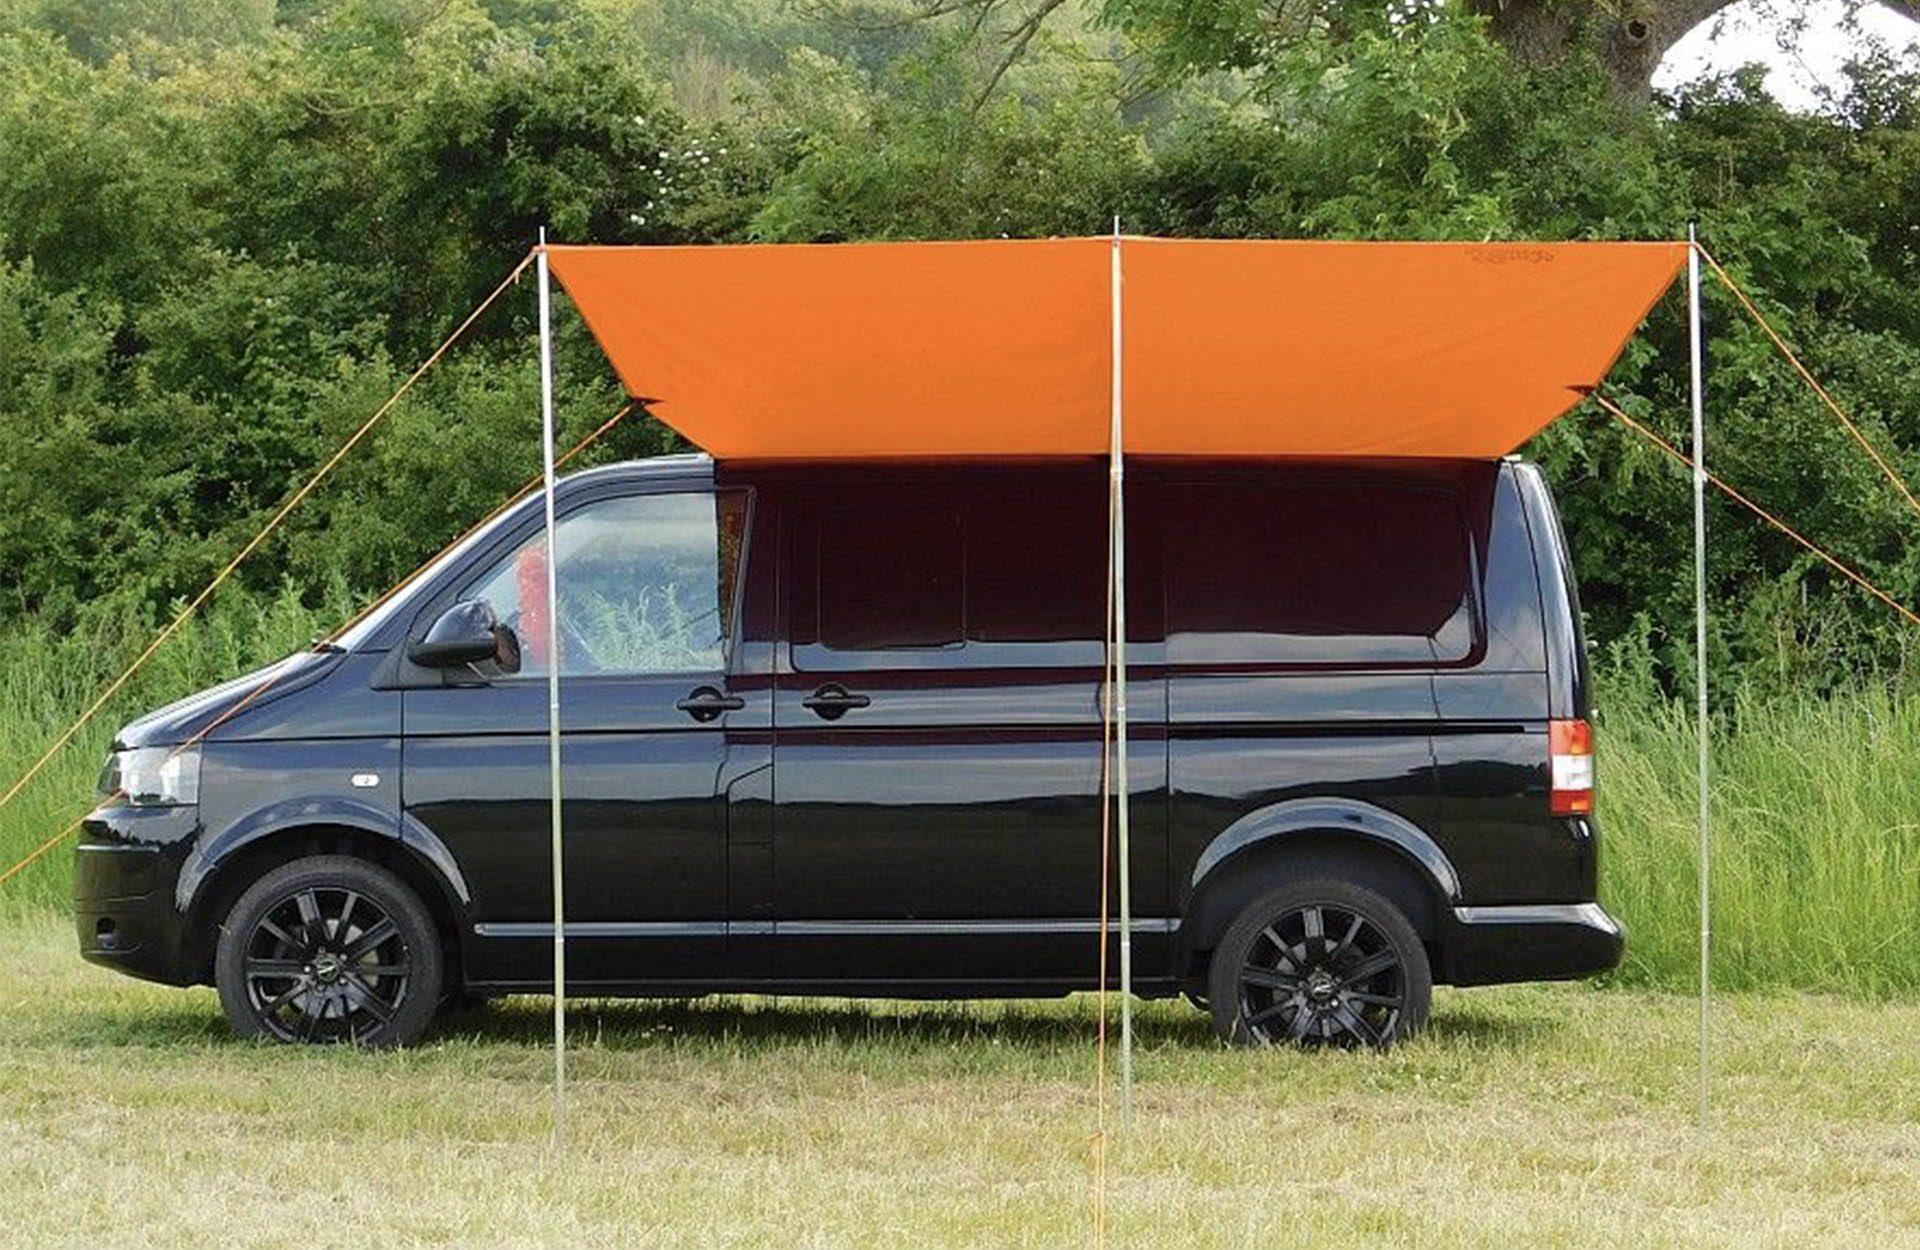 Best Camper Van Awnings For Summer Adventures 8 Models Reviewed